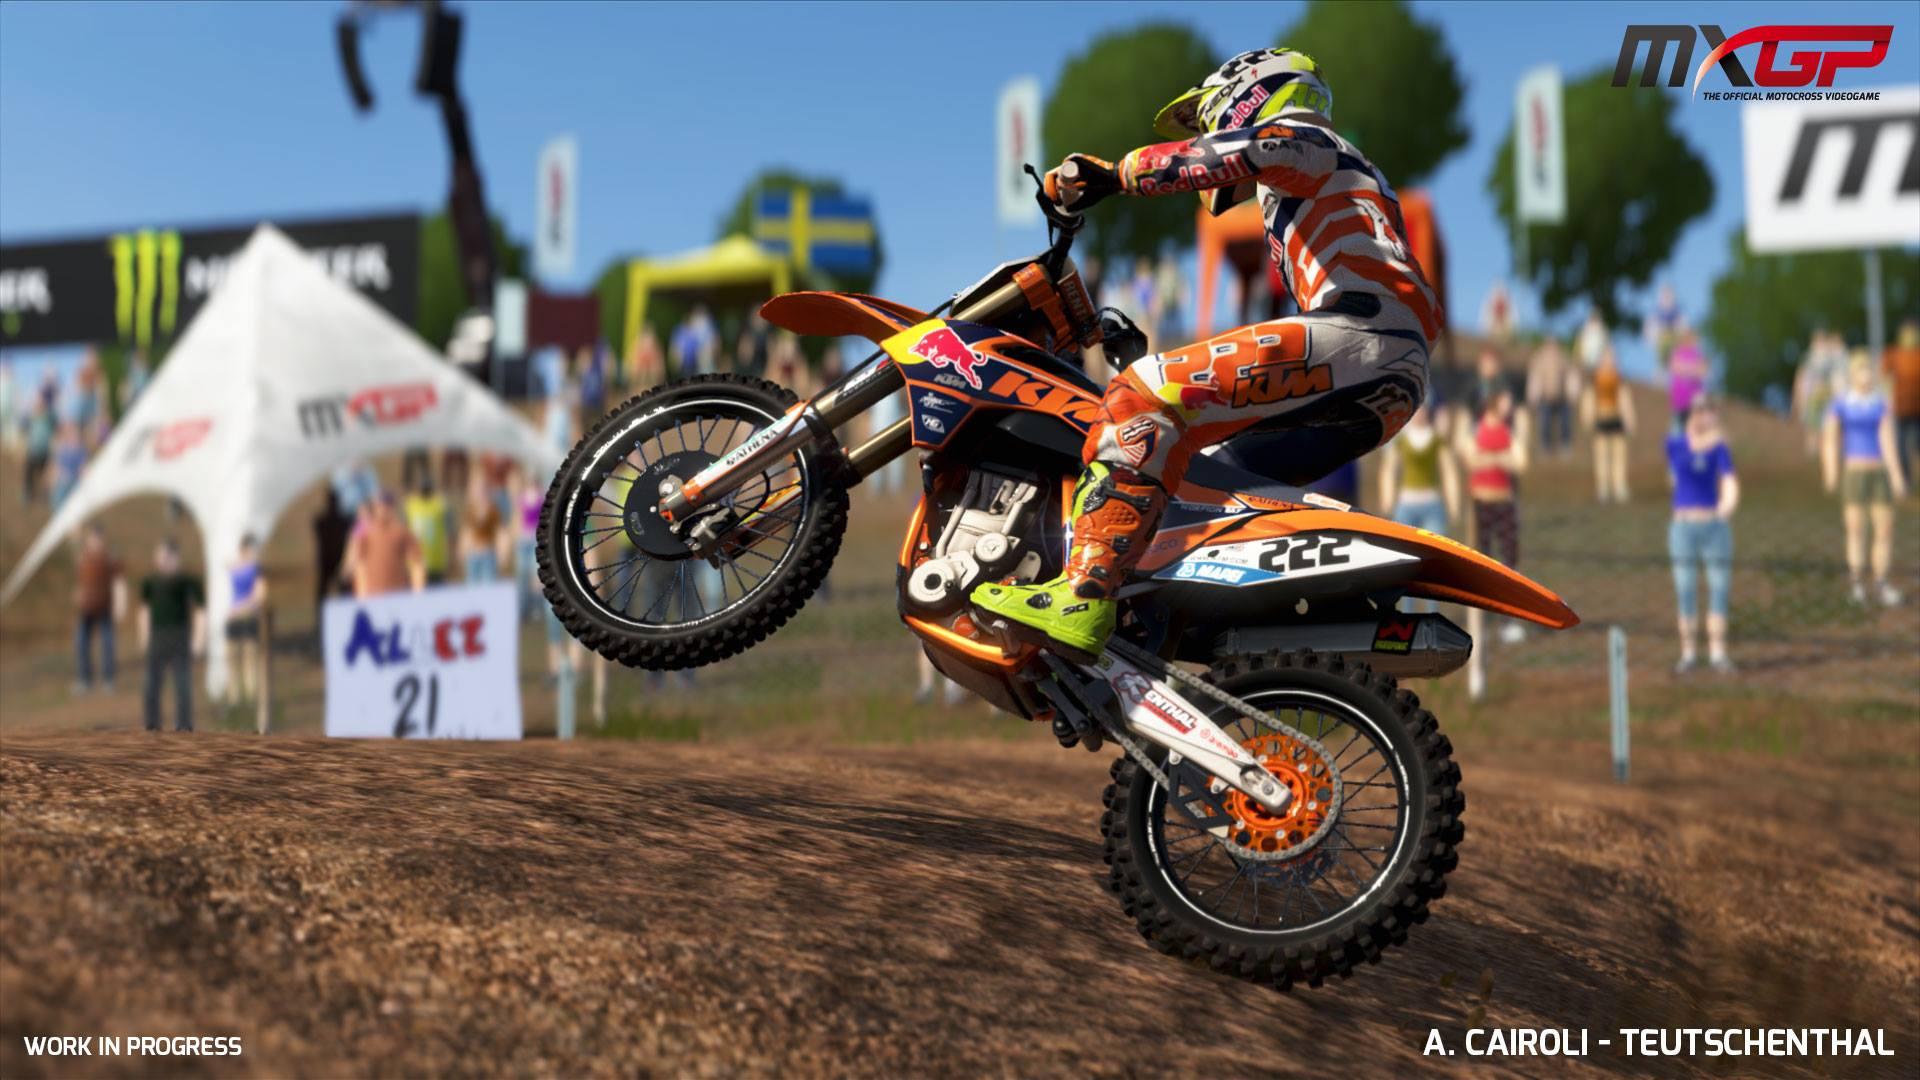 mxgp the official motocross videogame a la venta para ps4 demo disponible en playstation 4. Black Bedroom Furniture Sets. Home Design Ideas